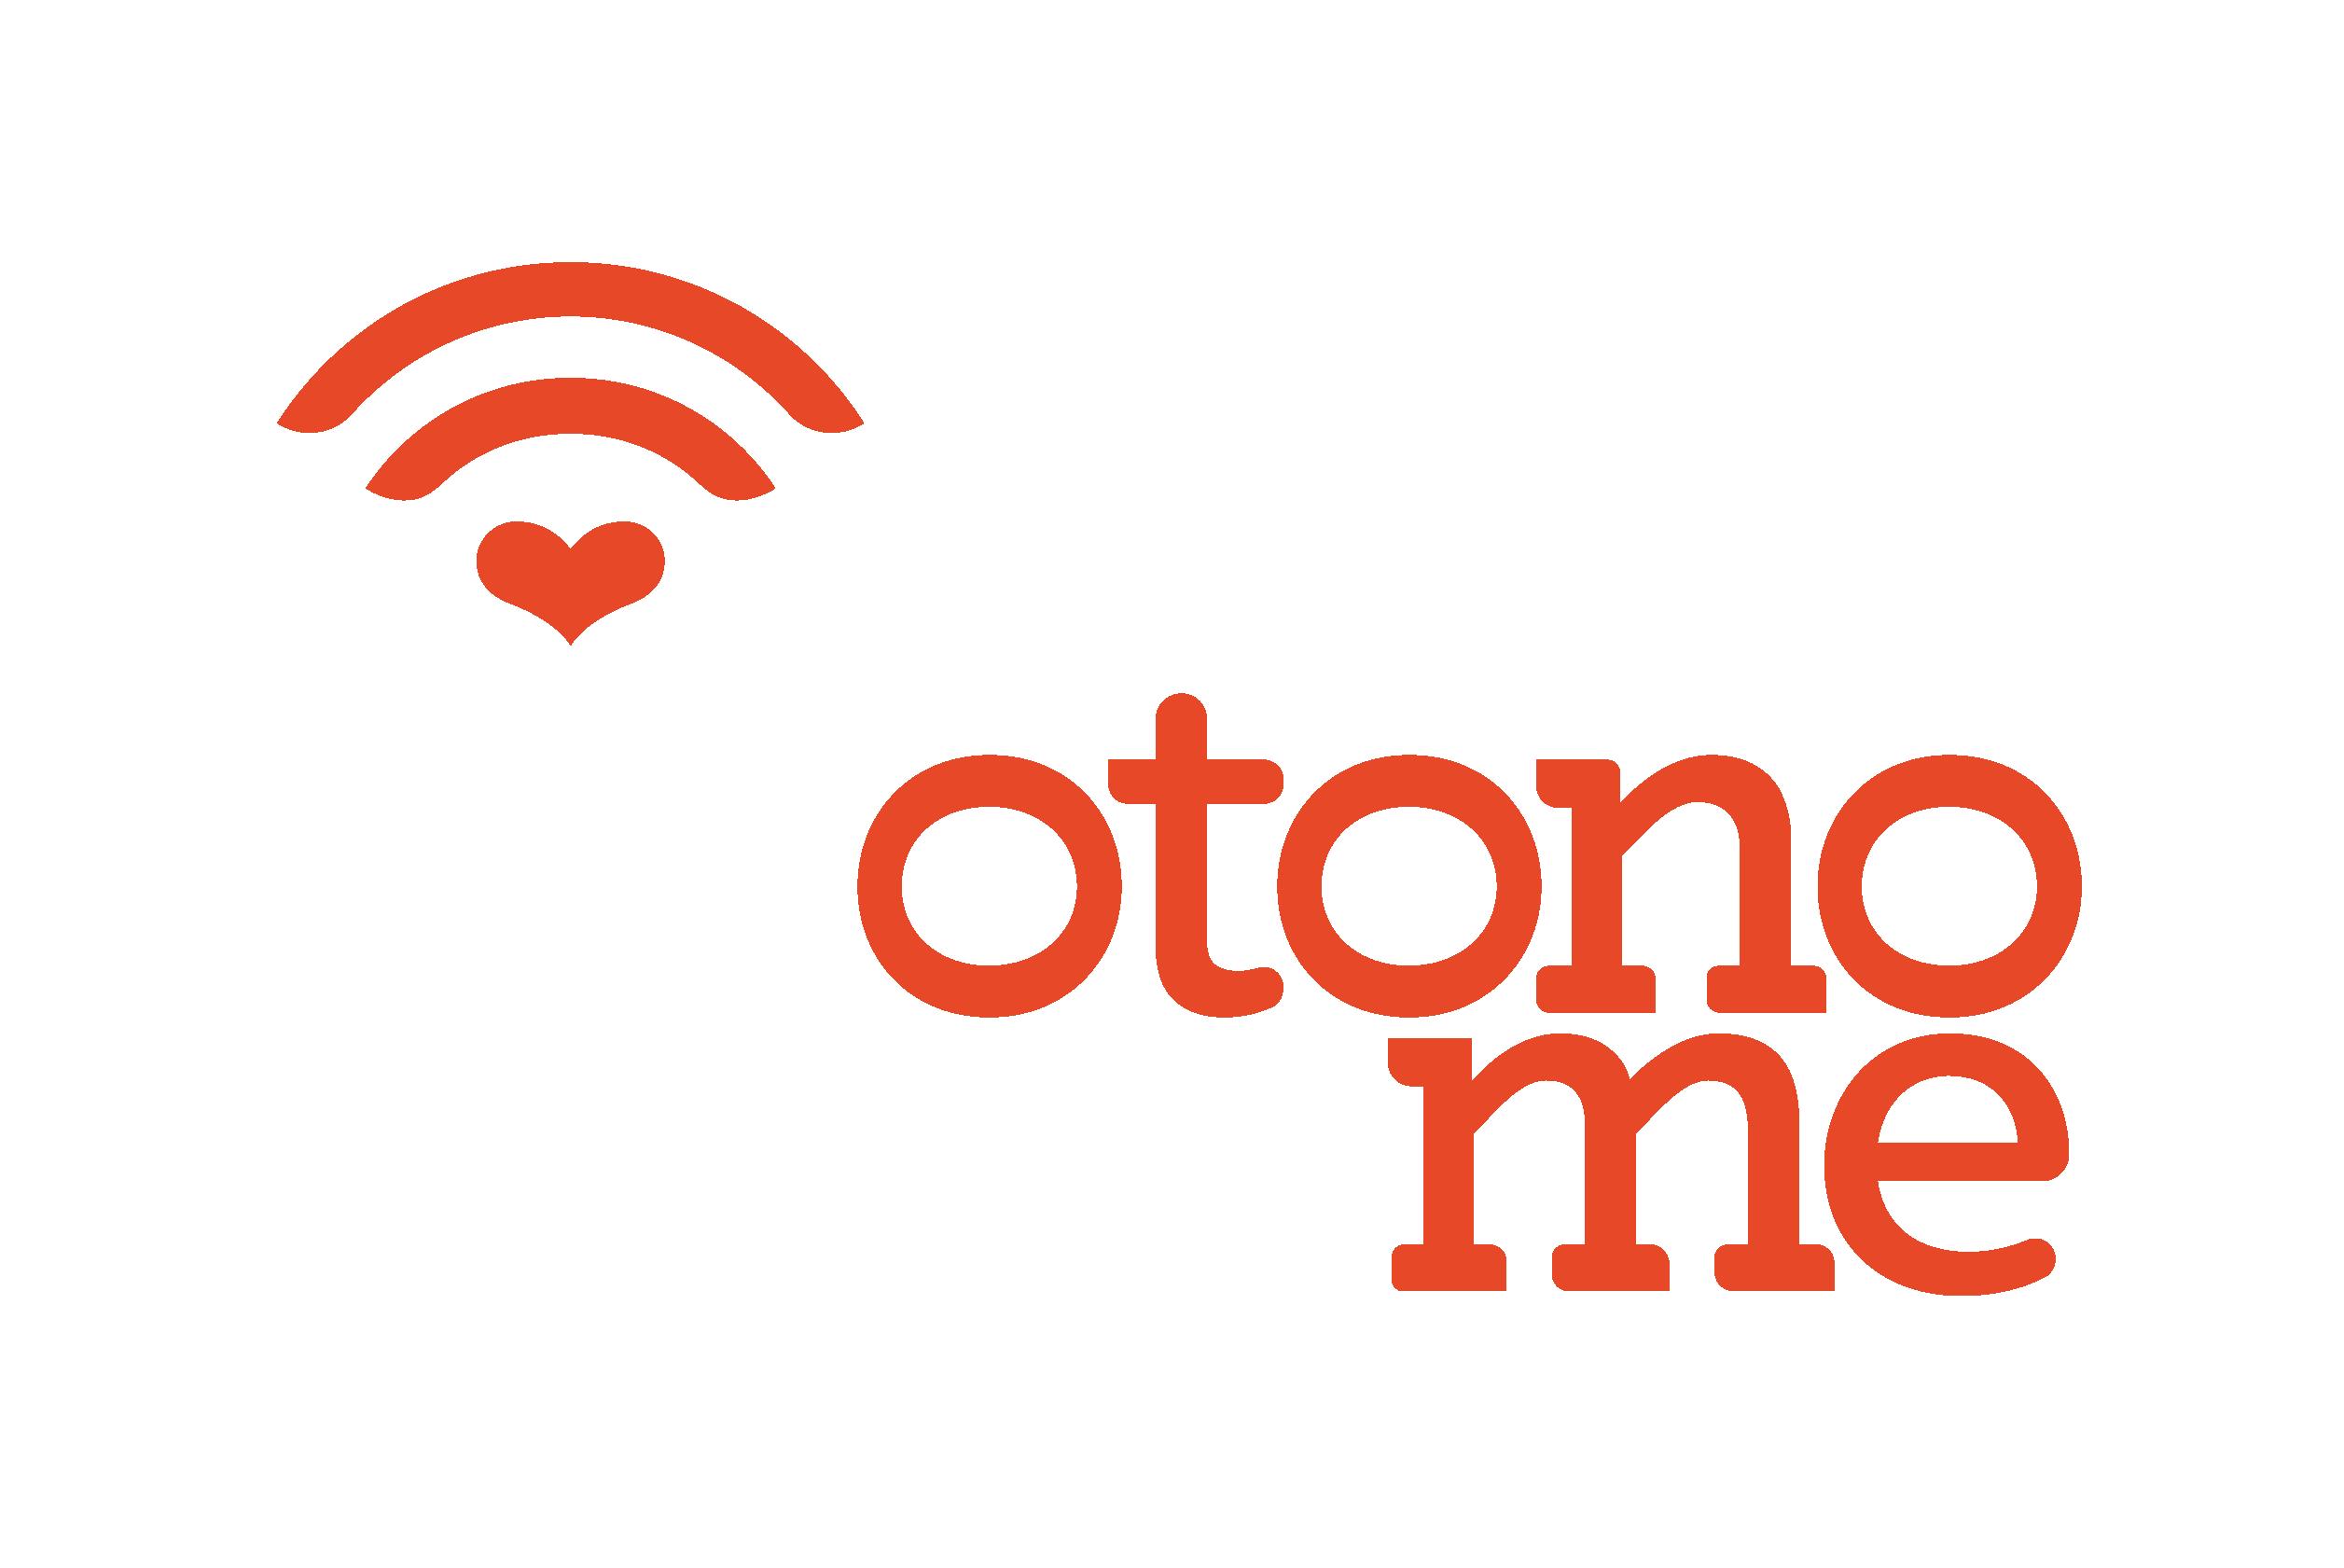 Logo complet OTONO-ME, le service de teleassistance innovante